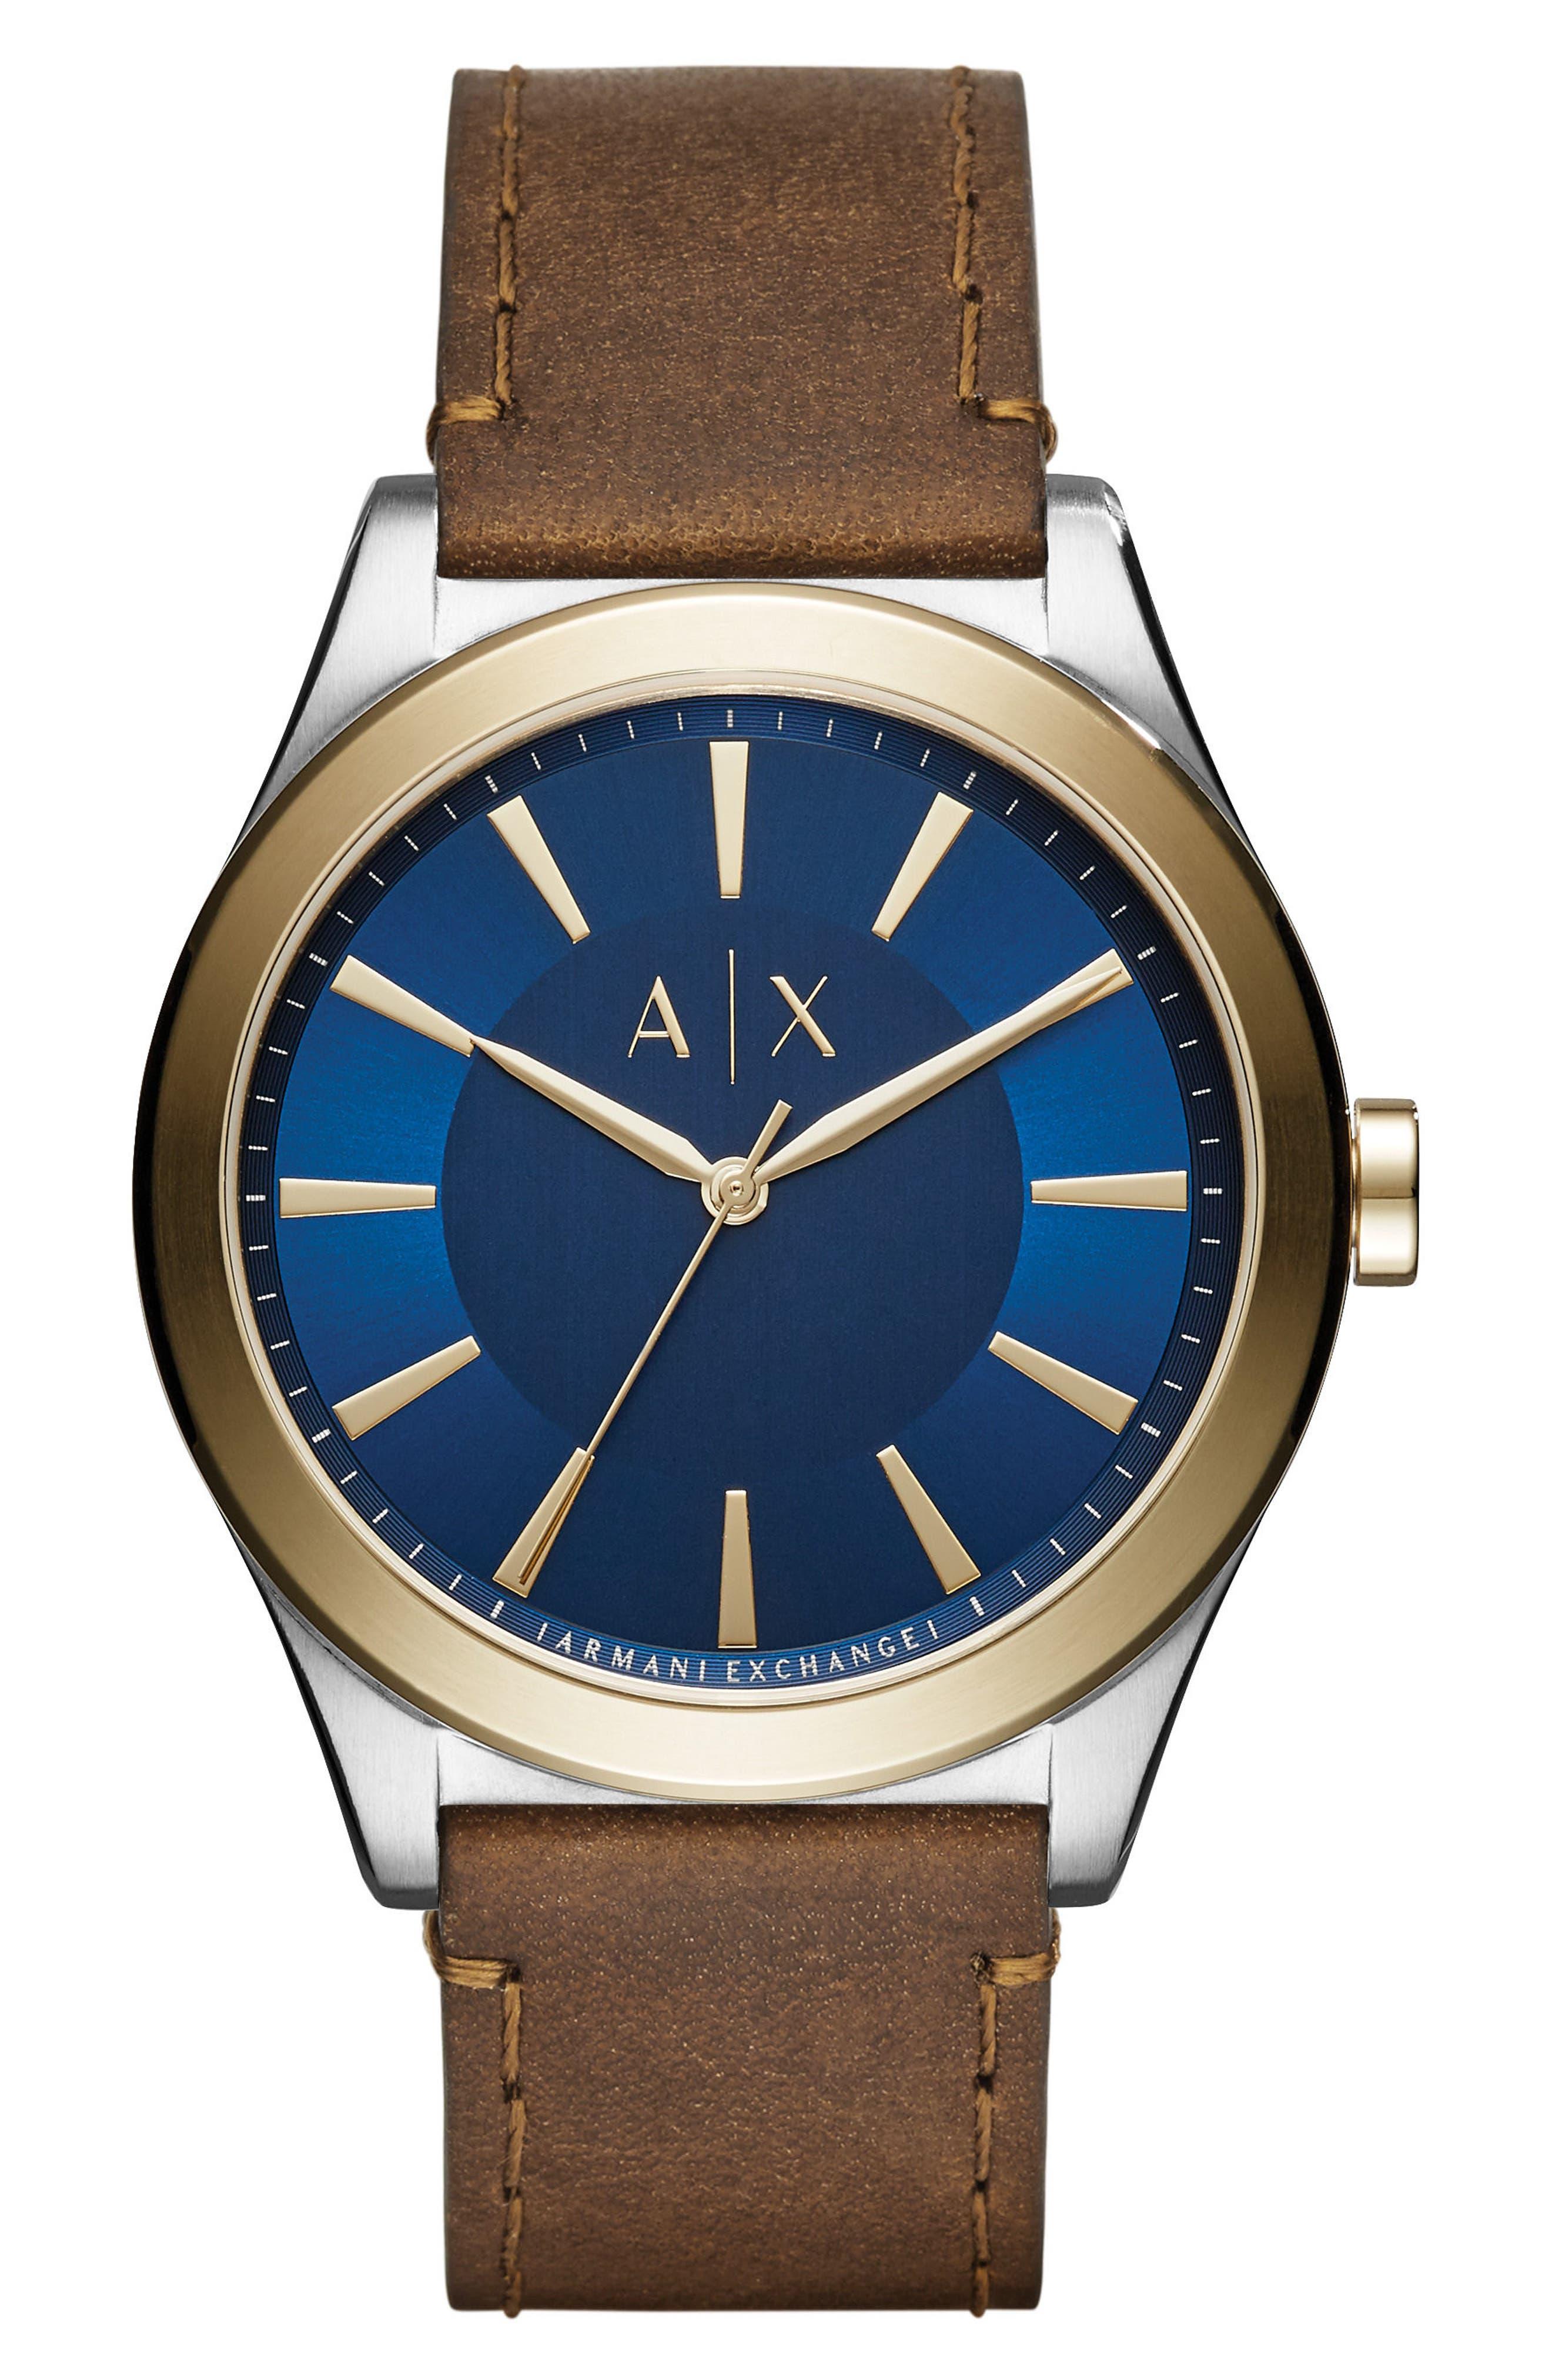 Main Image - AX Armani Exchange Nico Two-Tone Leather Strap Watch, 44mm